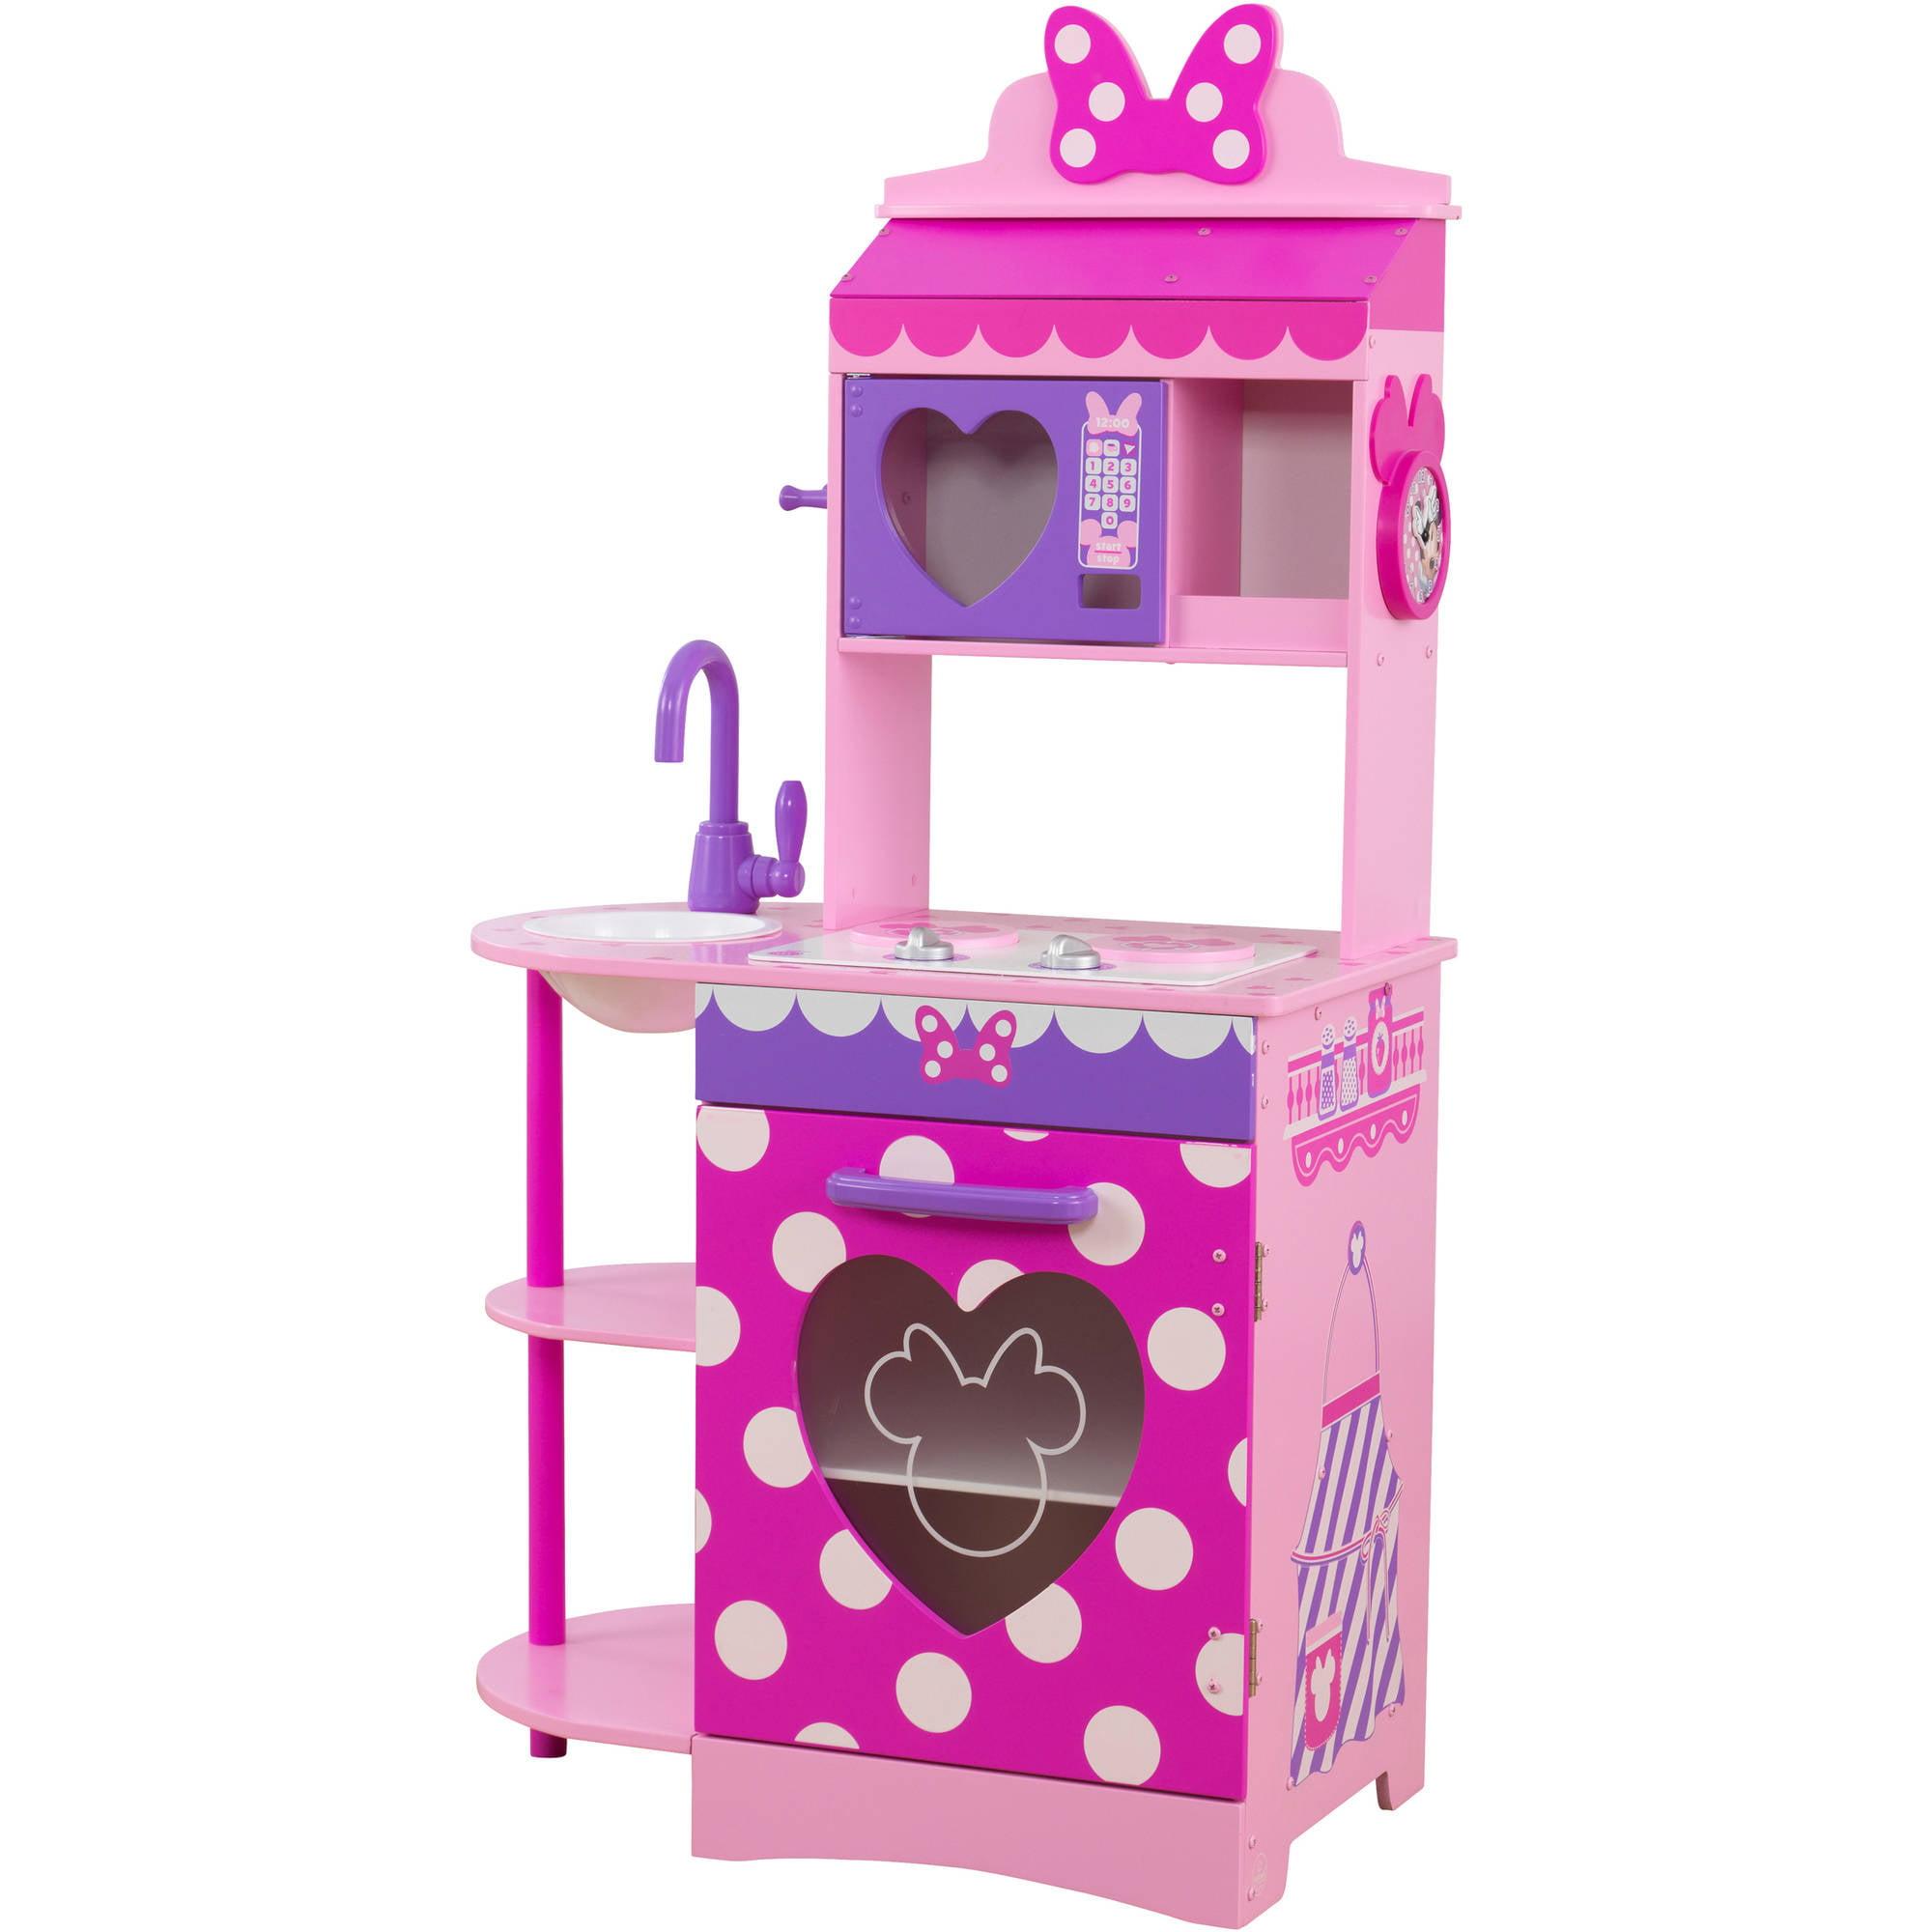 Disney Jr. Minnie Mouse Toddler Kitchen by KidKraft by KidKraft